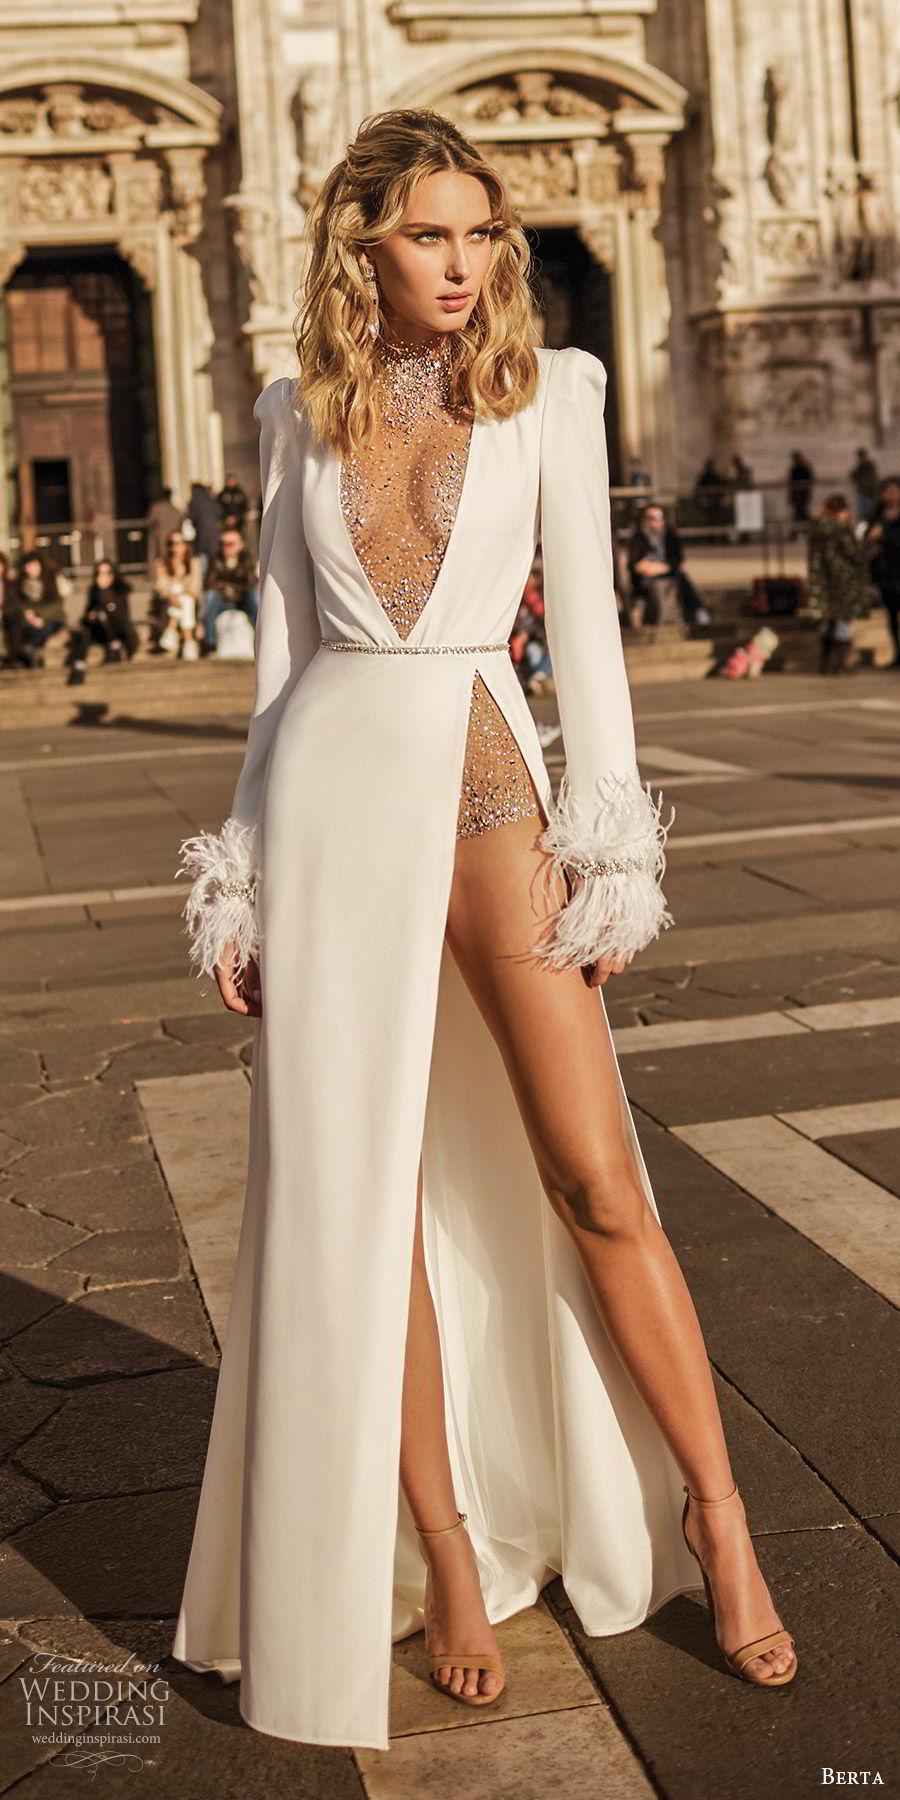 berta spring 2020 bridal long sleeve illusion high neck deep v neckline high slit skirt a line wedding dress (8) glam sexy modern mv